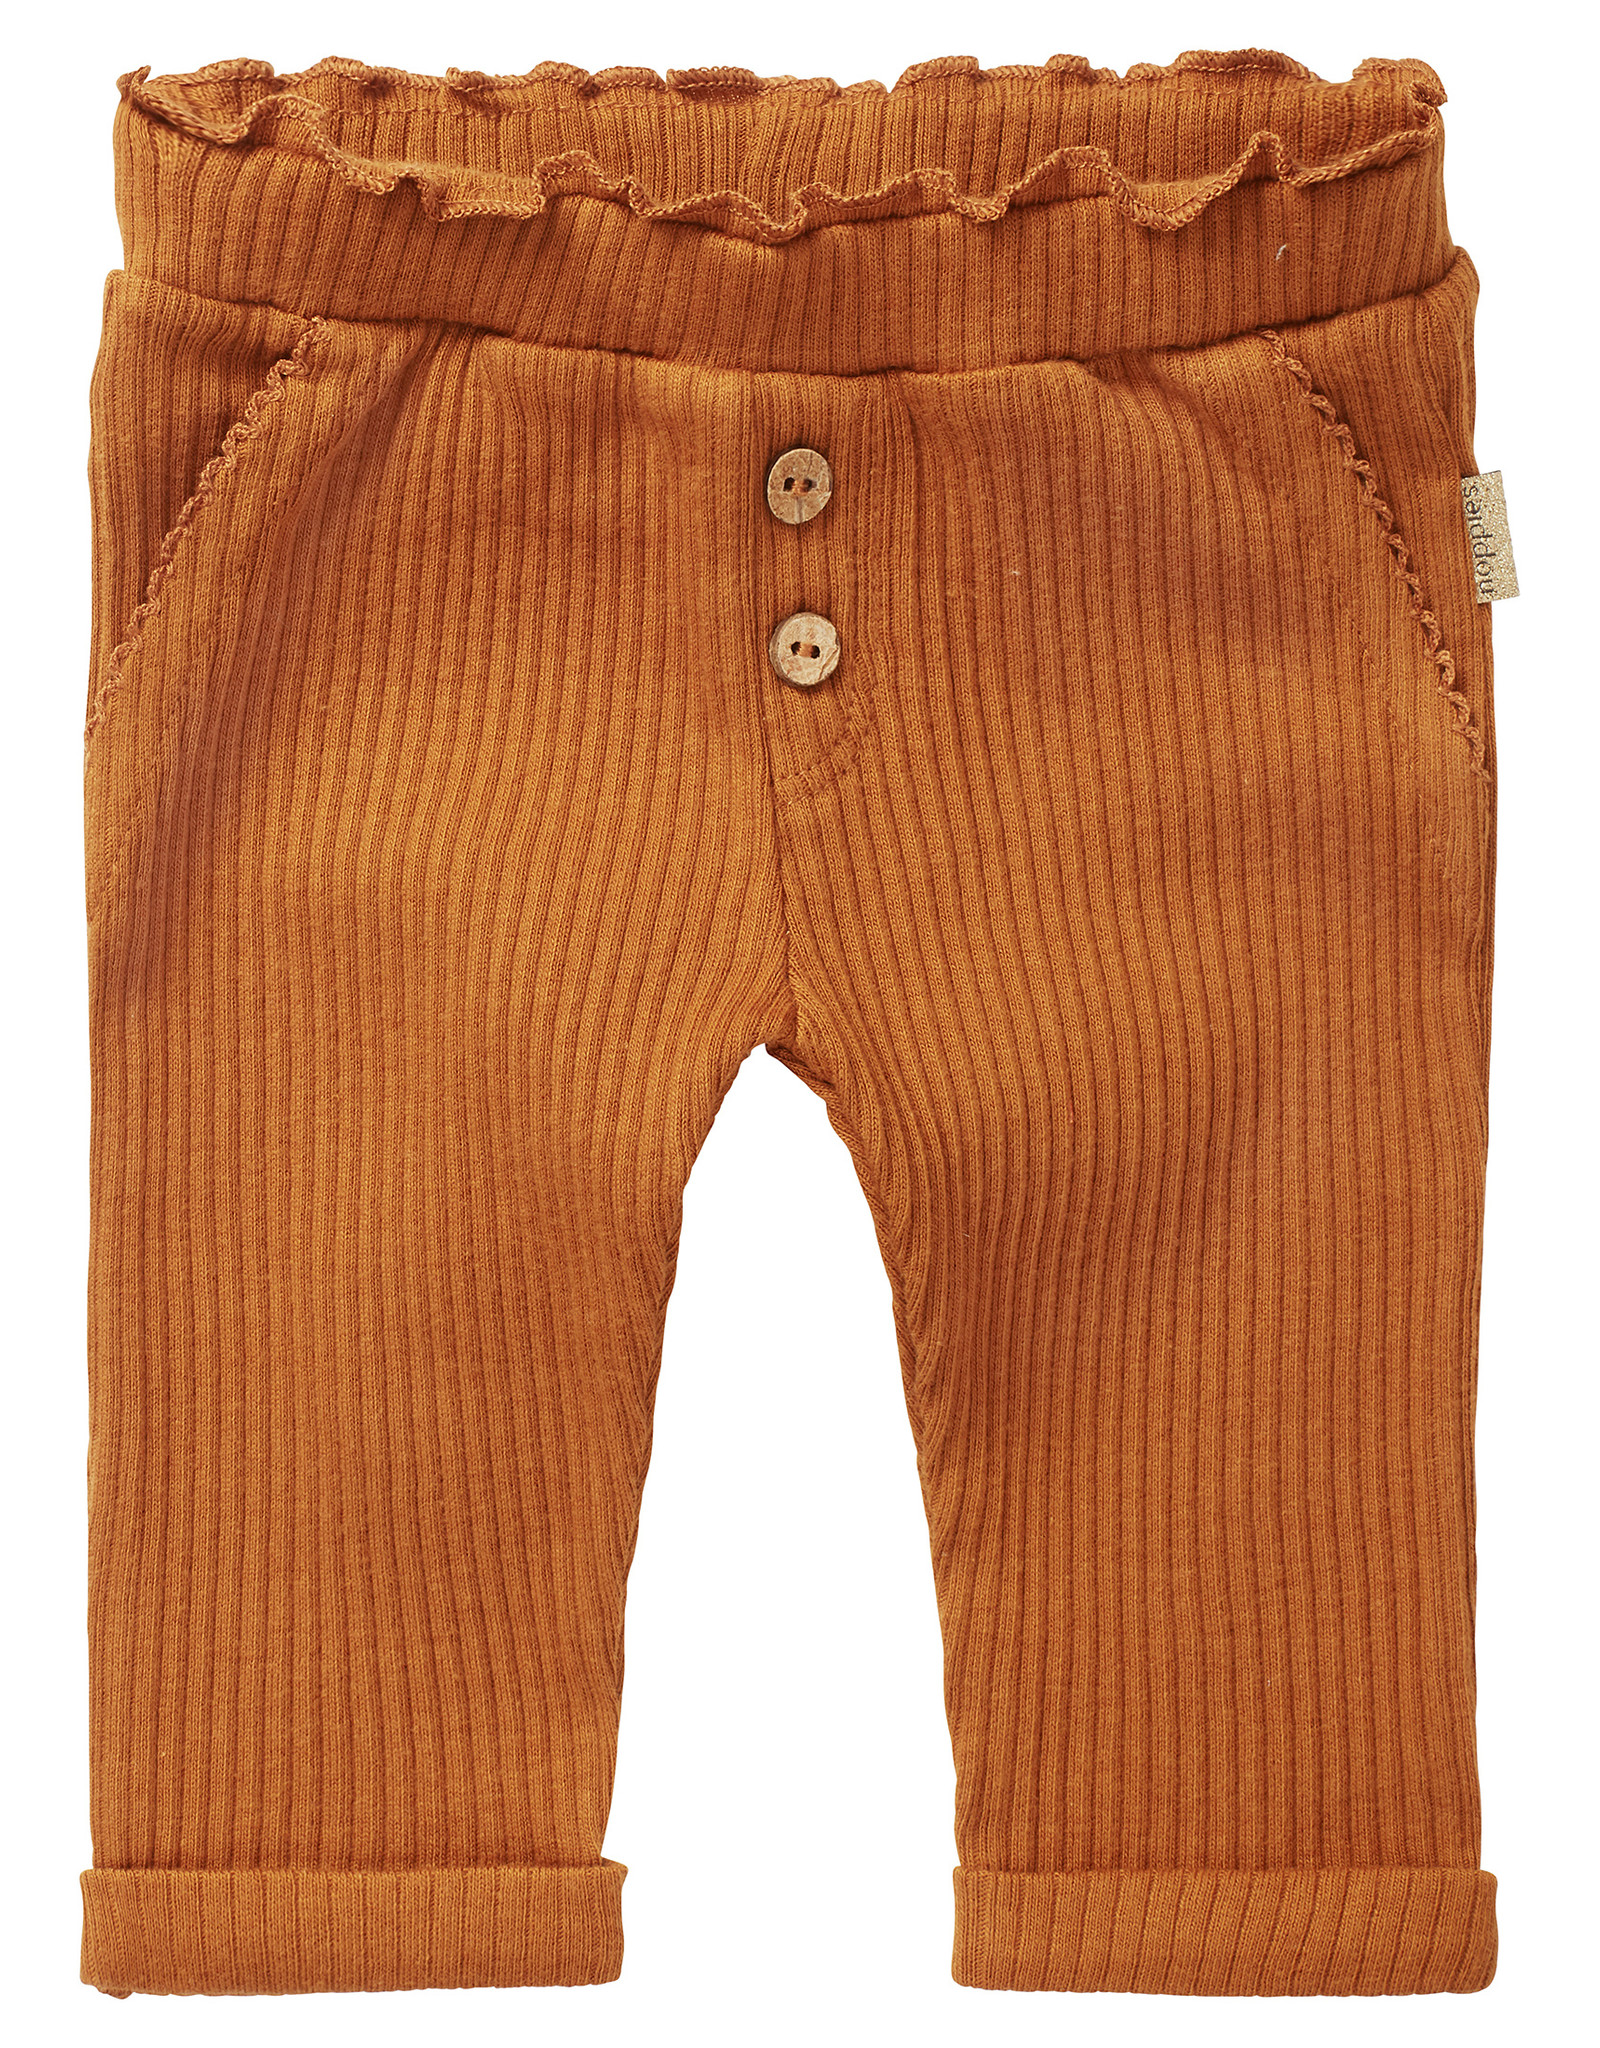 Noppies G Slim fit Pants Mascouche, Roasted Pecan